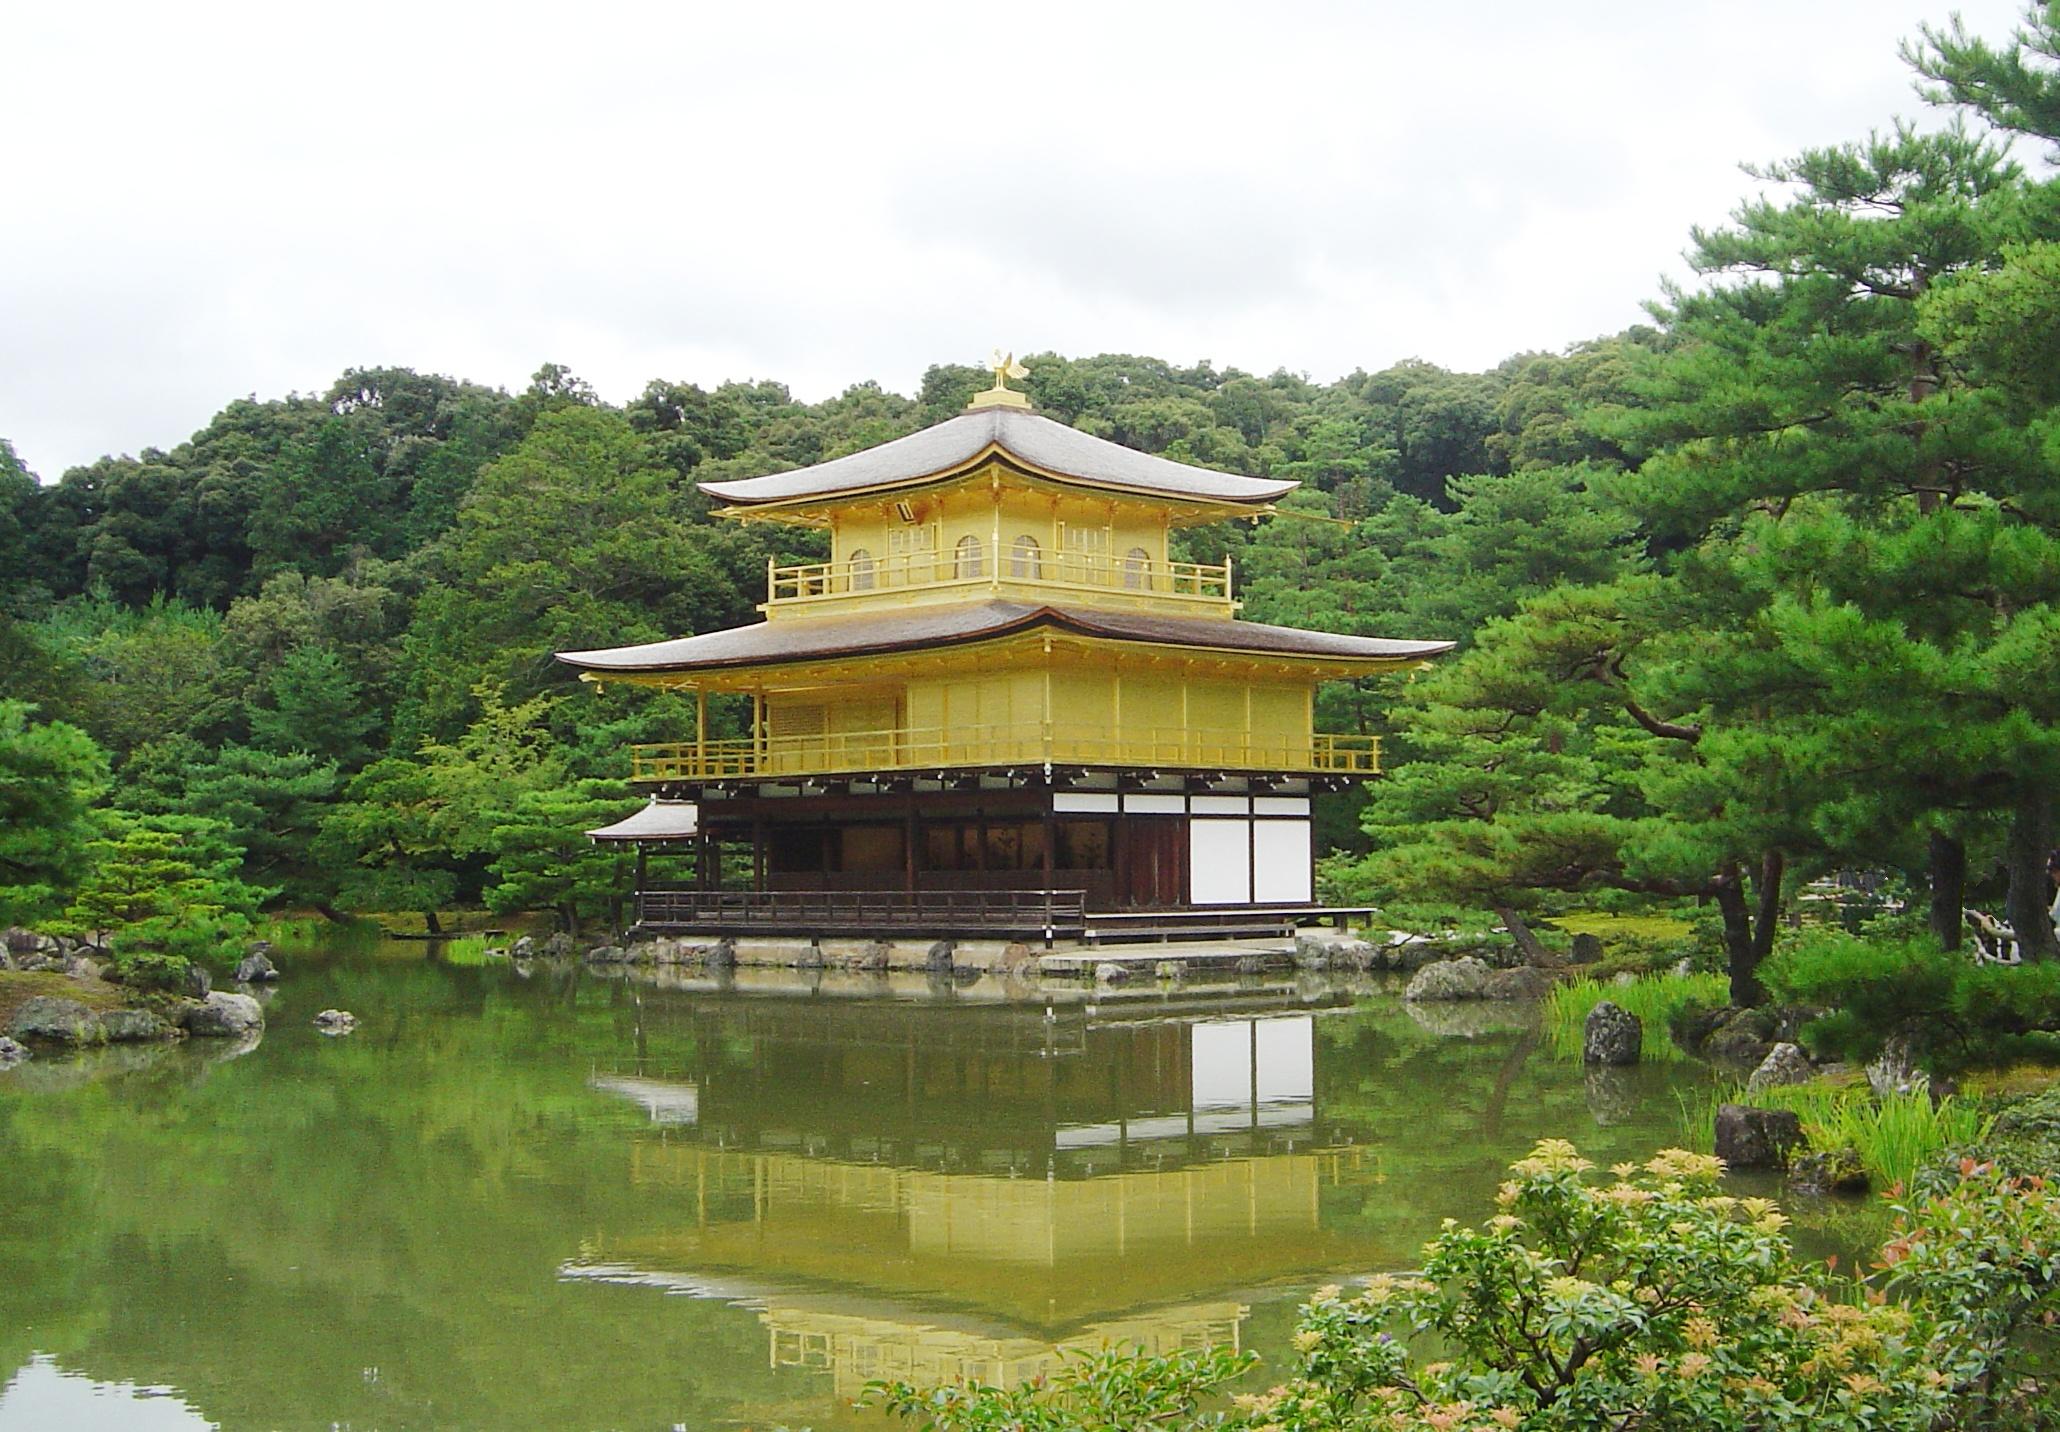 Japan_Kyoto_Kinkakuji_DSC00117